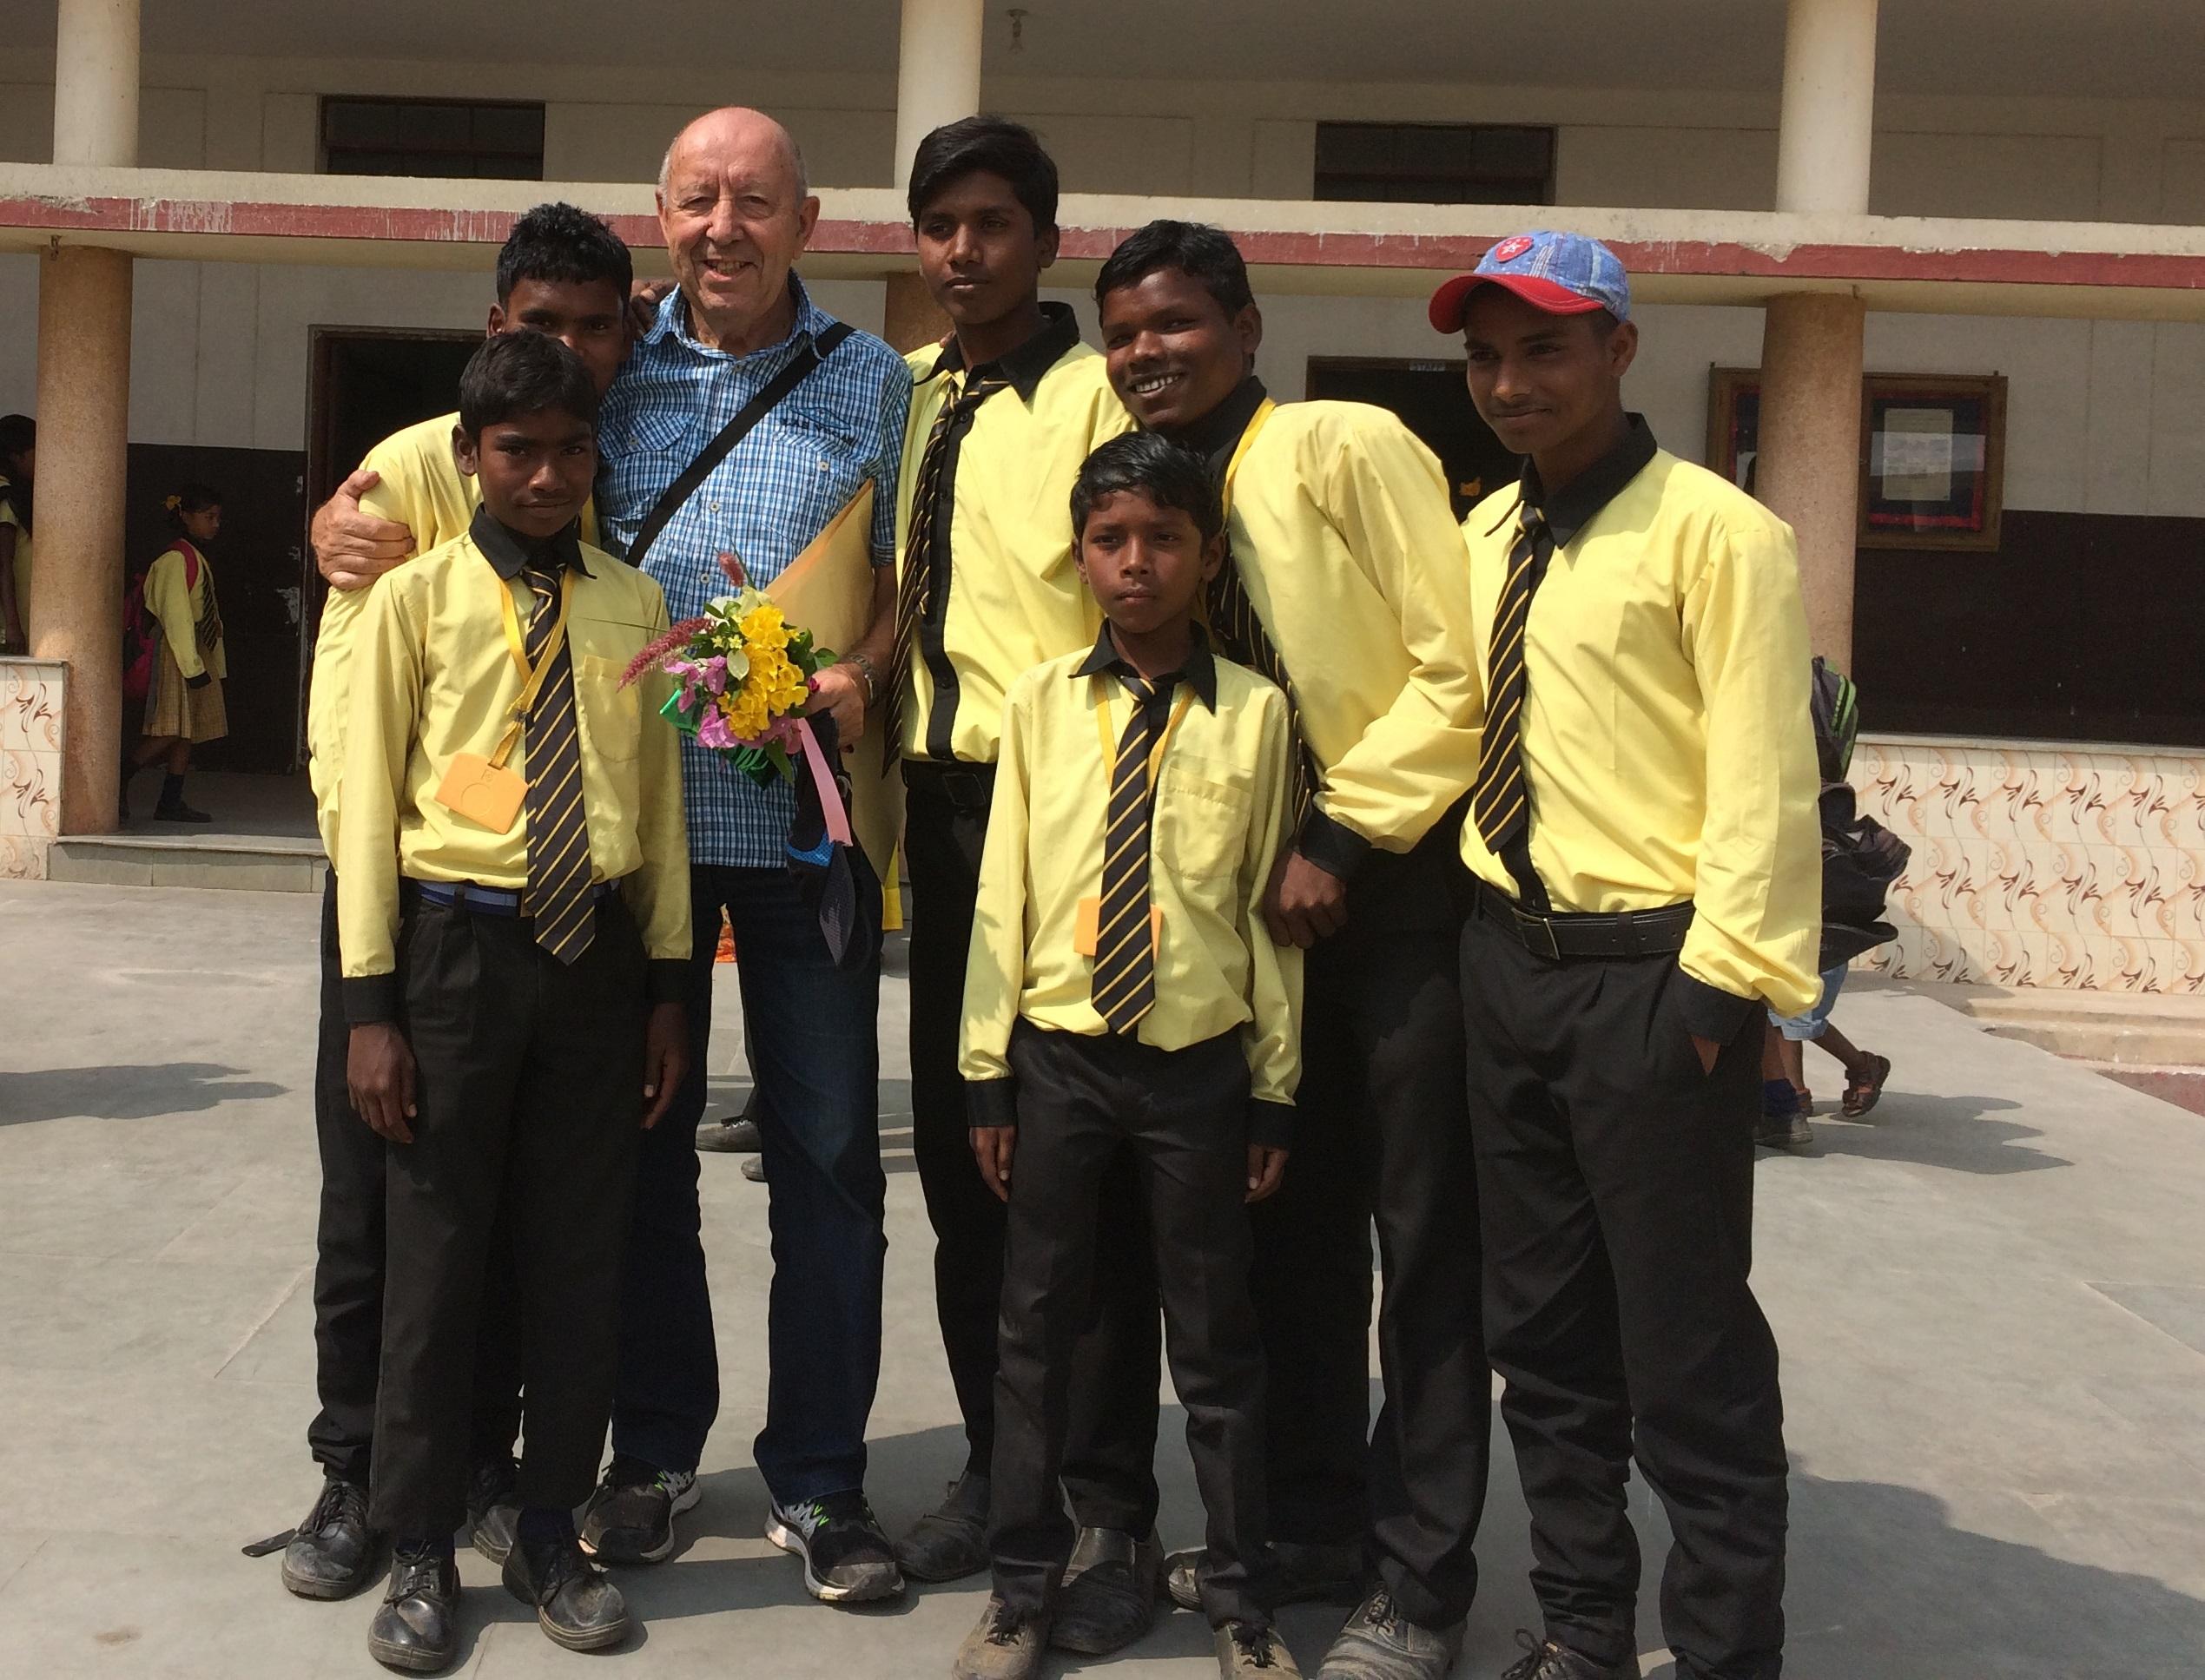 André Ornelis, oud-directeur basisschool Sint-Medardus, Ursel. Zuidacties 'Smile Simalia' en 'Respect Chhoti', India.